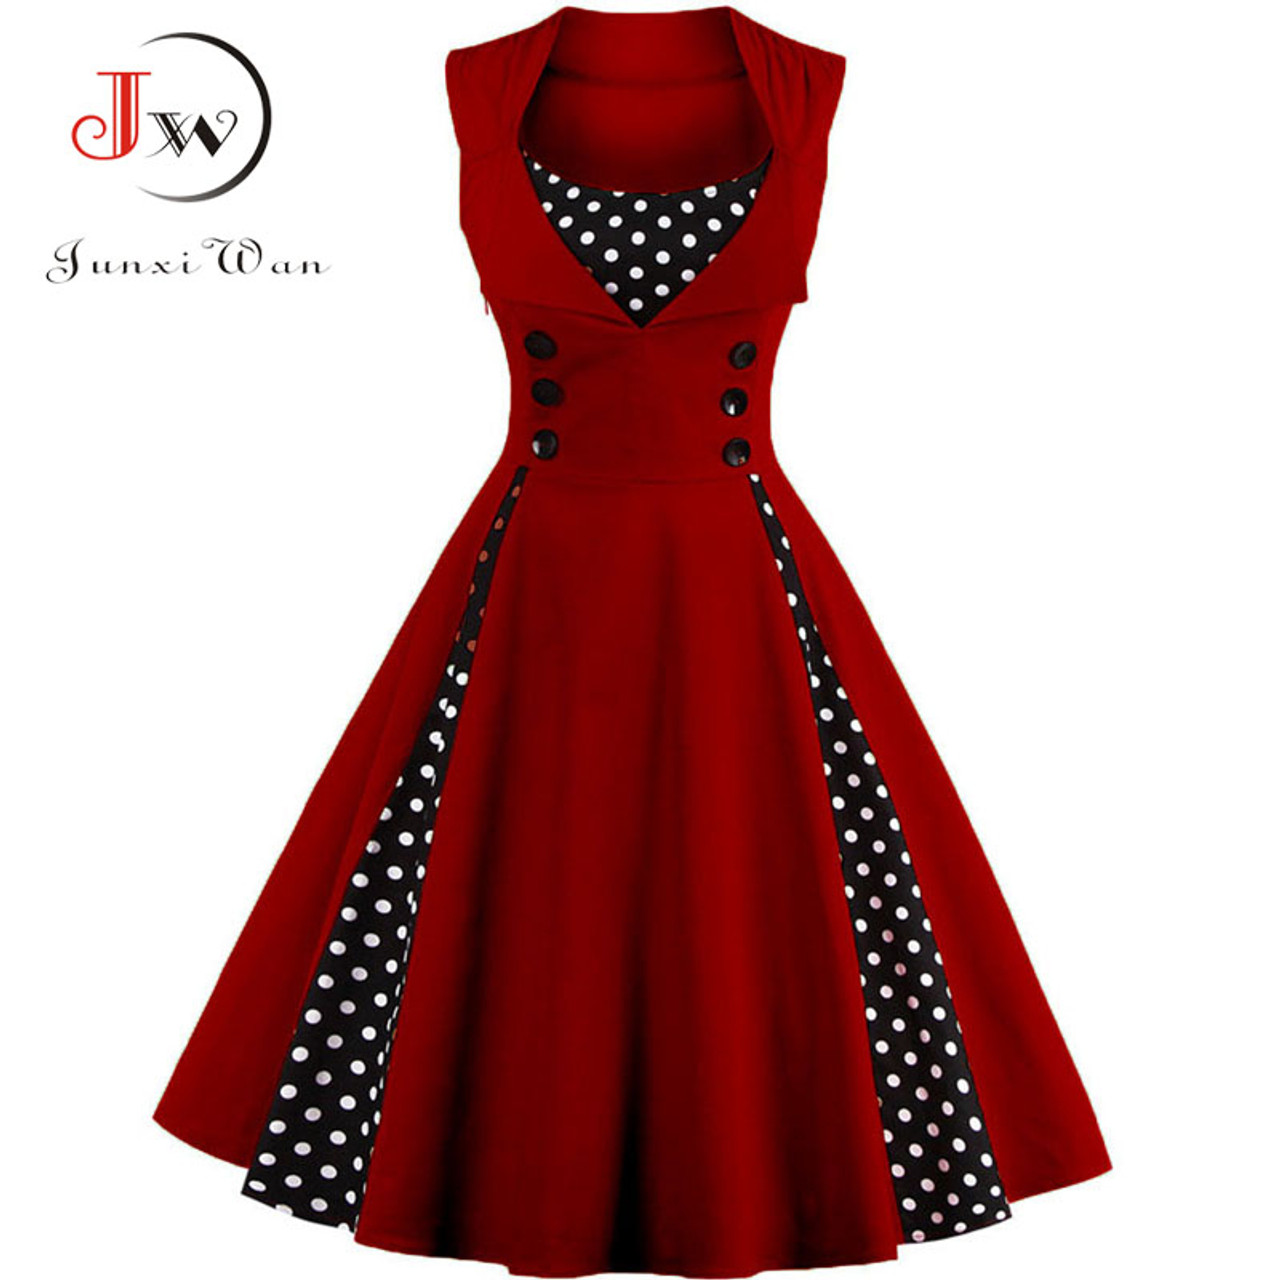 b7a43bbb096a7 S-4XL Women Robe Retro 2018 Vintage Dress 50s 60s Rockabilly Dot Swing Pin  Up Summer Party Dresses Elegant Tunic Vestidos Casual